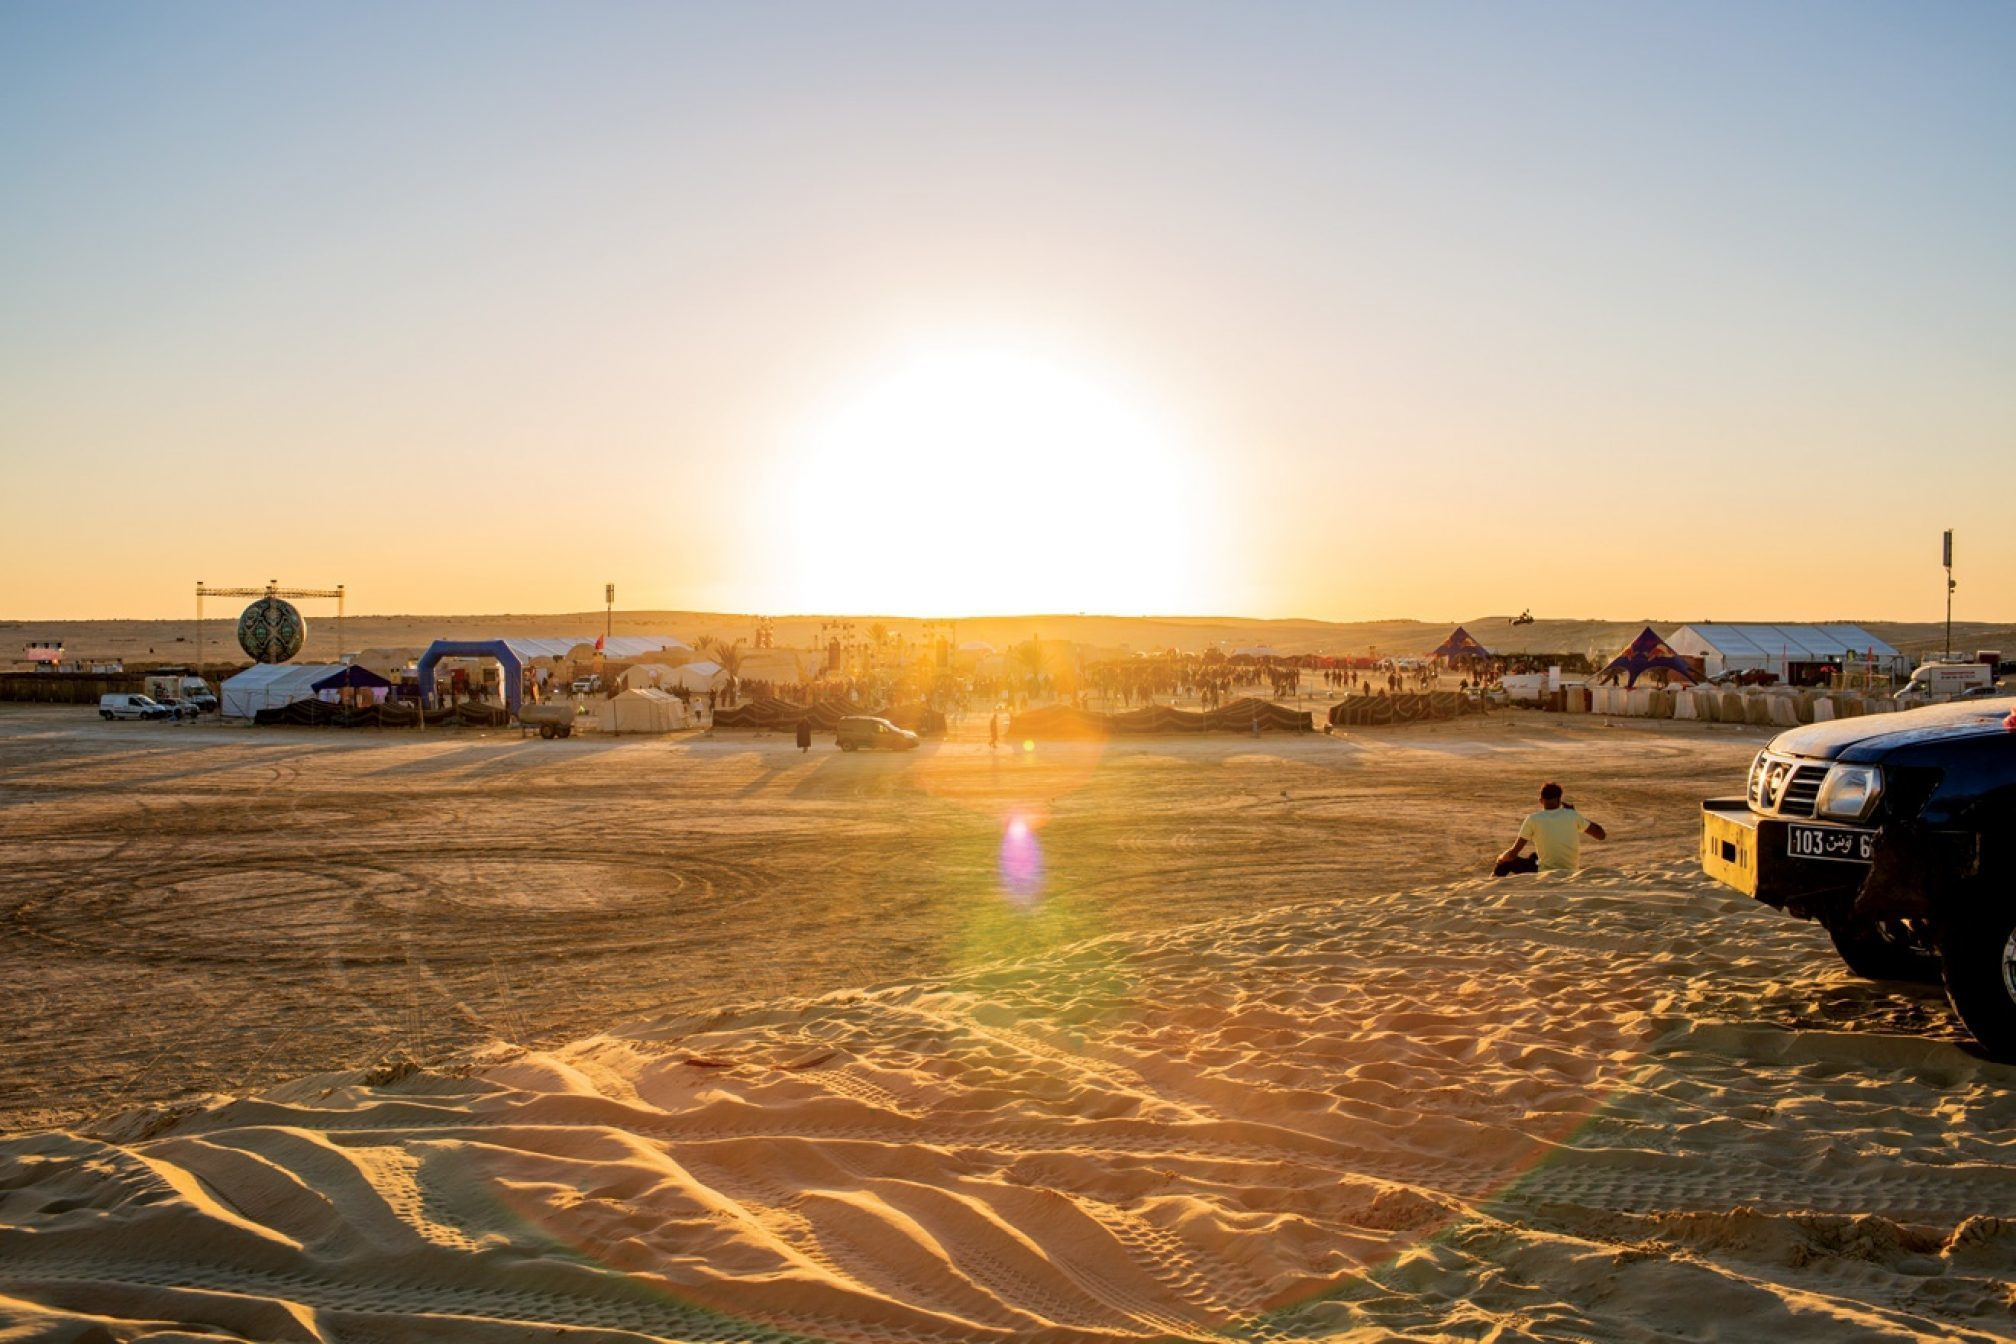 Tunisia S Desert Festival Les Dunes Electronique Takes